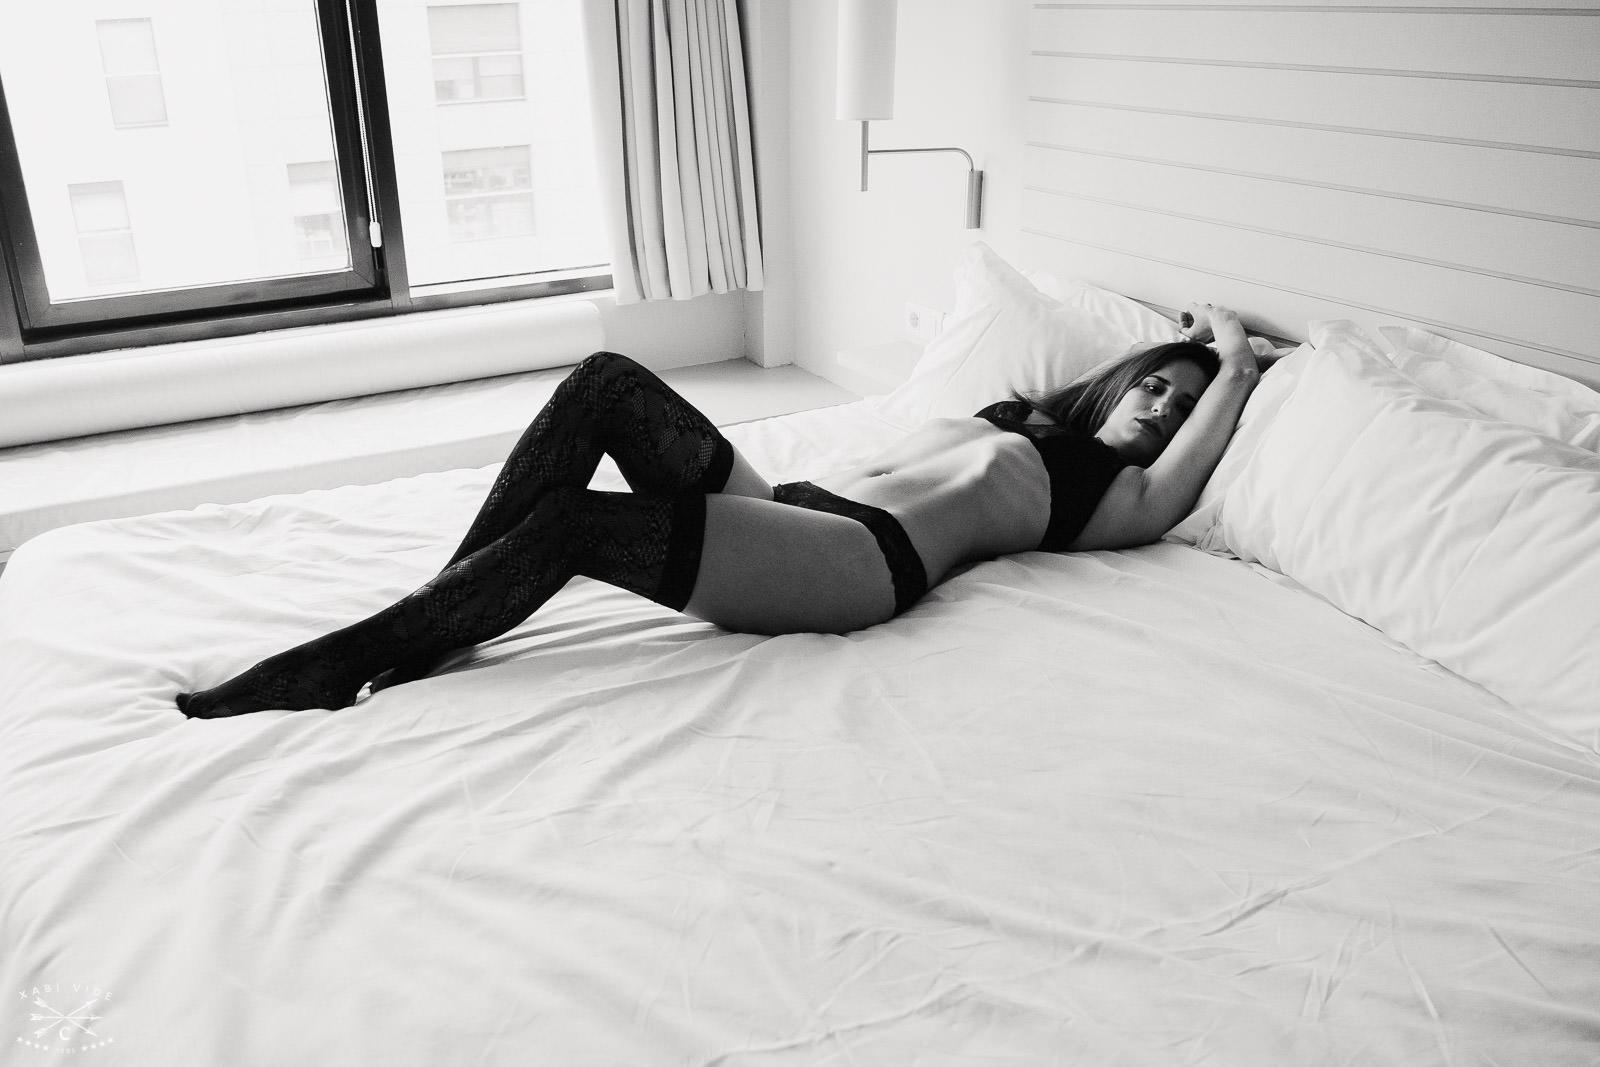 nagore fotografia boudoir en bilbao-16